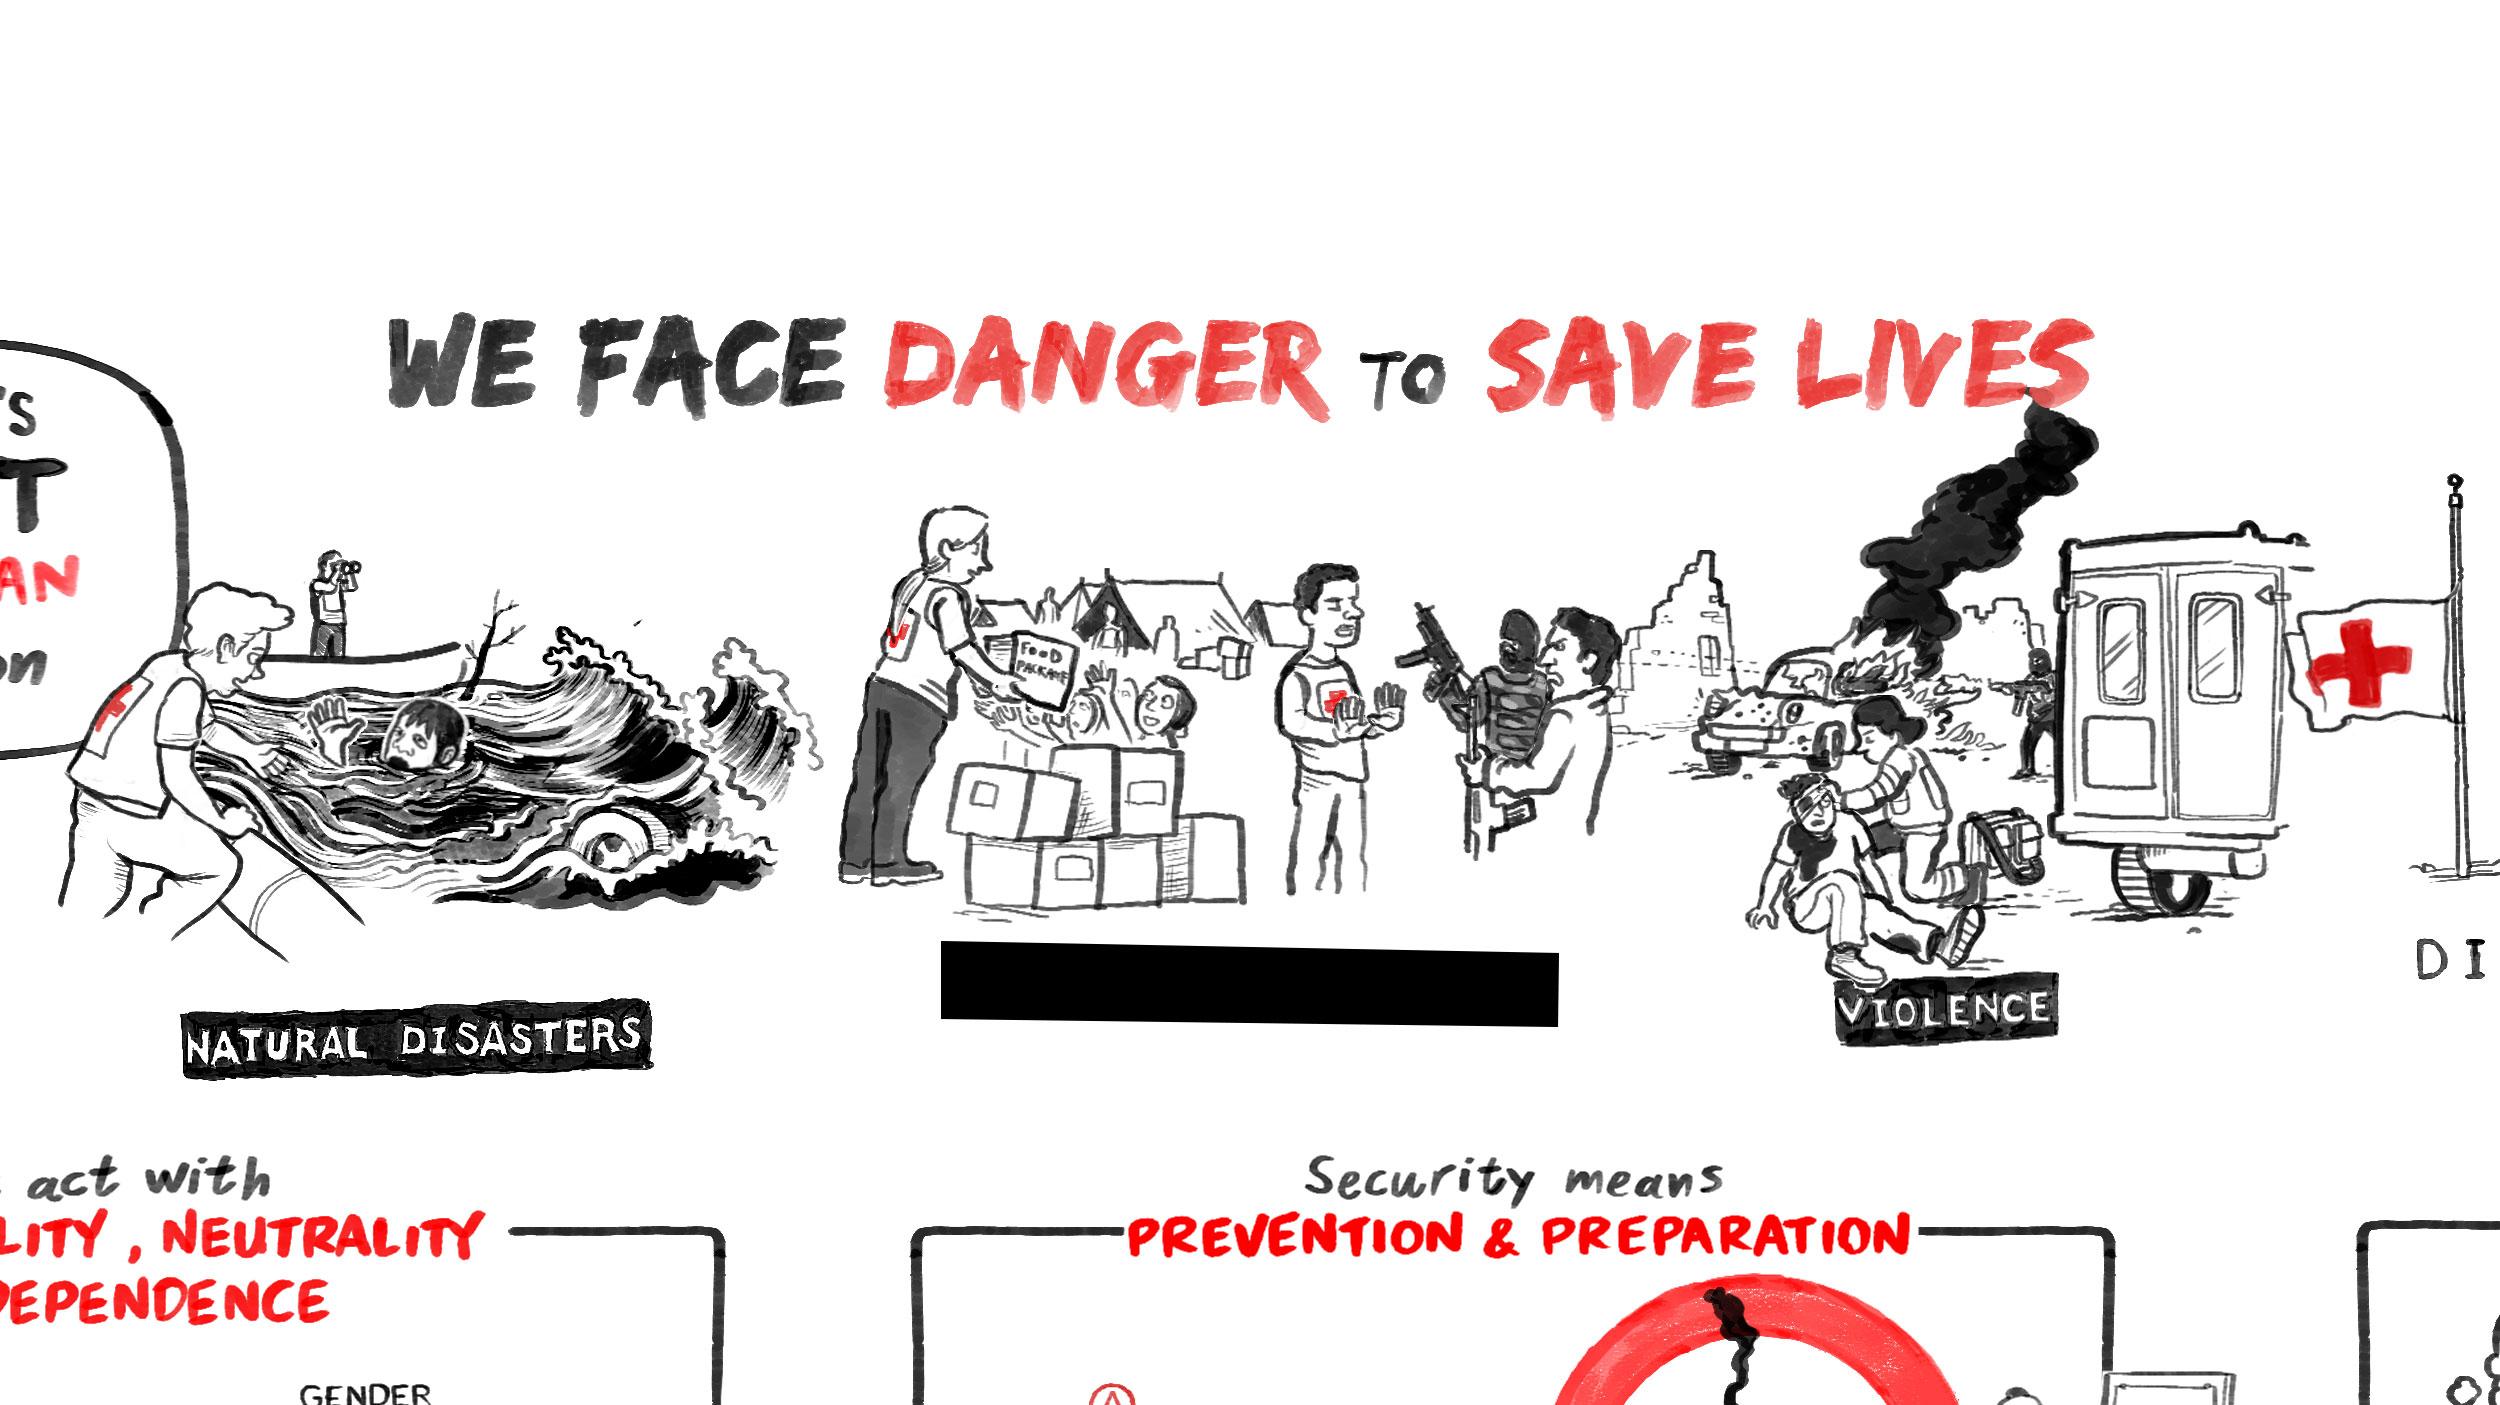 red-cross-saving-lives-changing-minds-cognitive-05.jpg